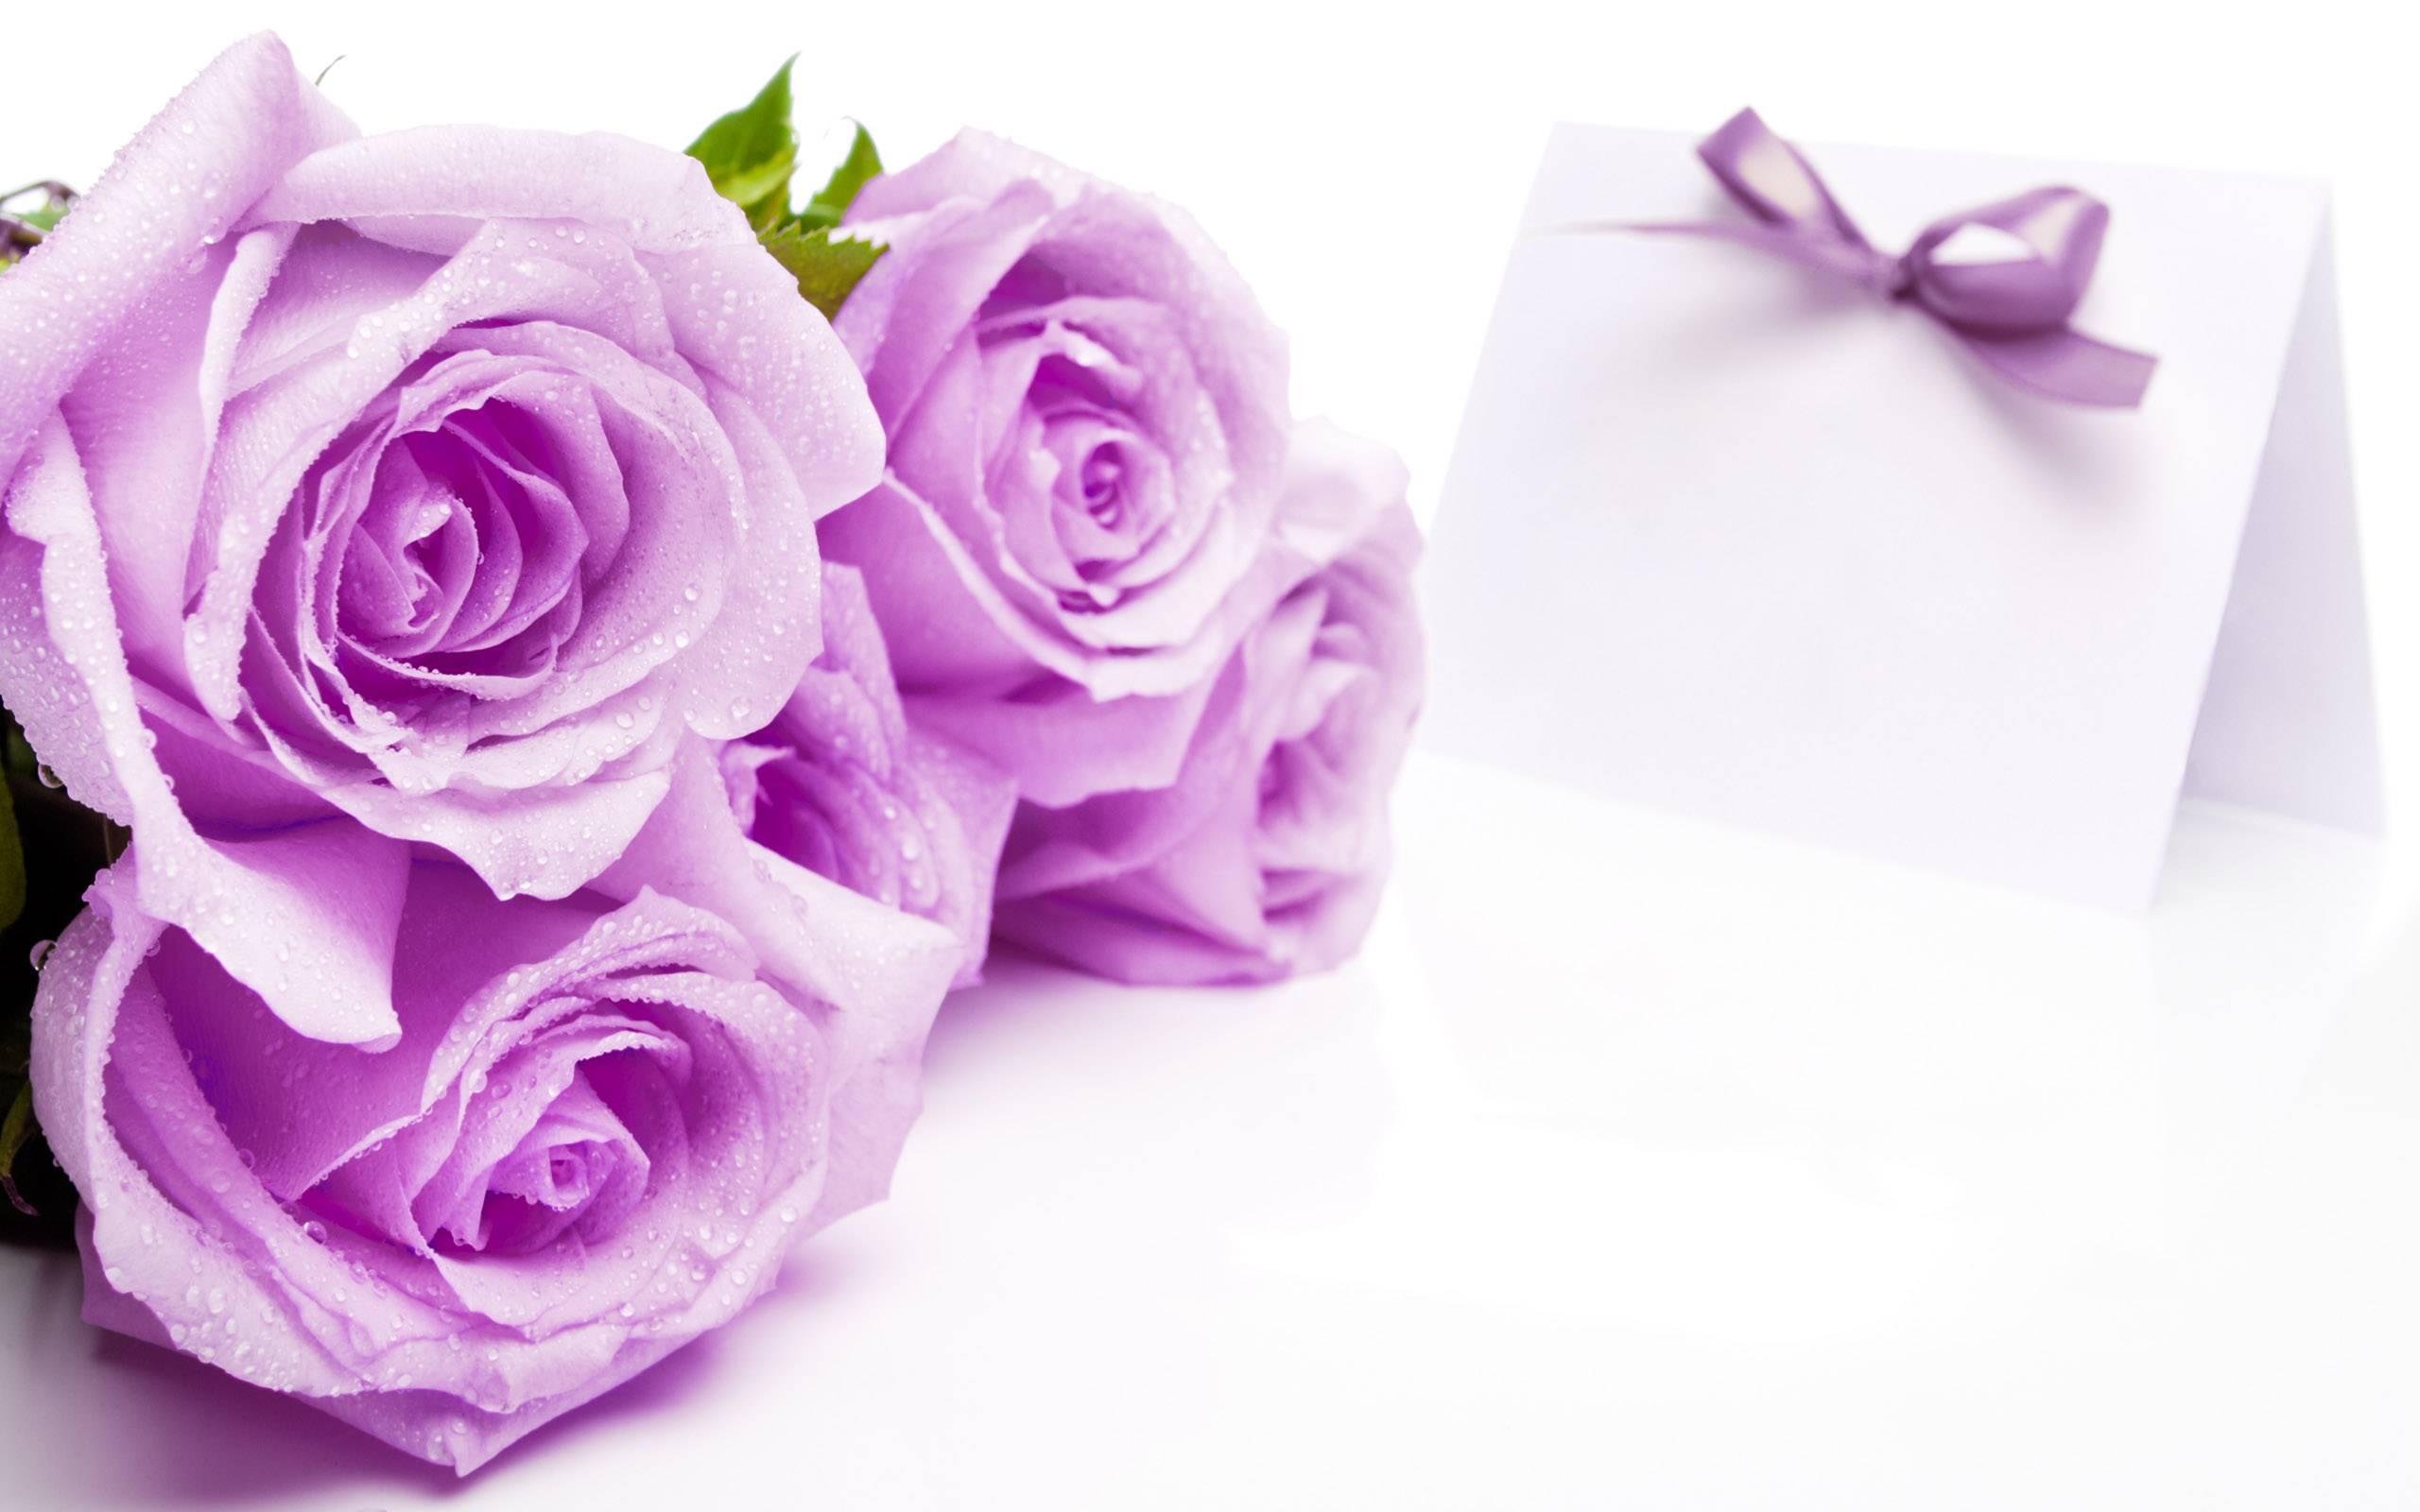 Veronica flower shop calgary by veronica flower shop infographic flowers for birthday wedding valentine frendship congratulations love romance sympthy get well soon anniversary izmirmasajfo